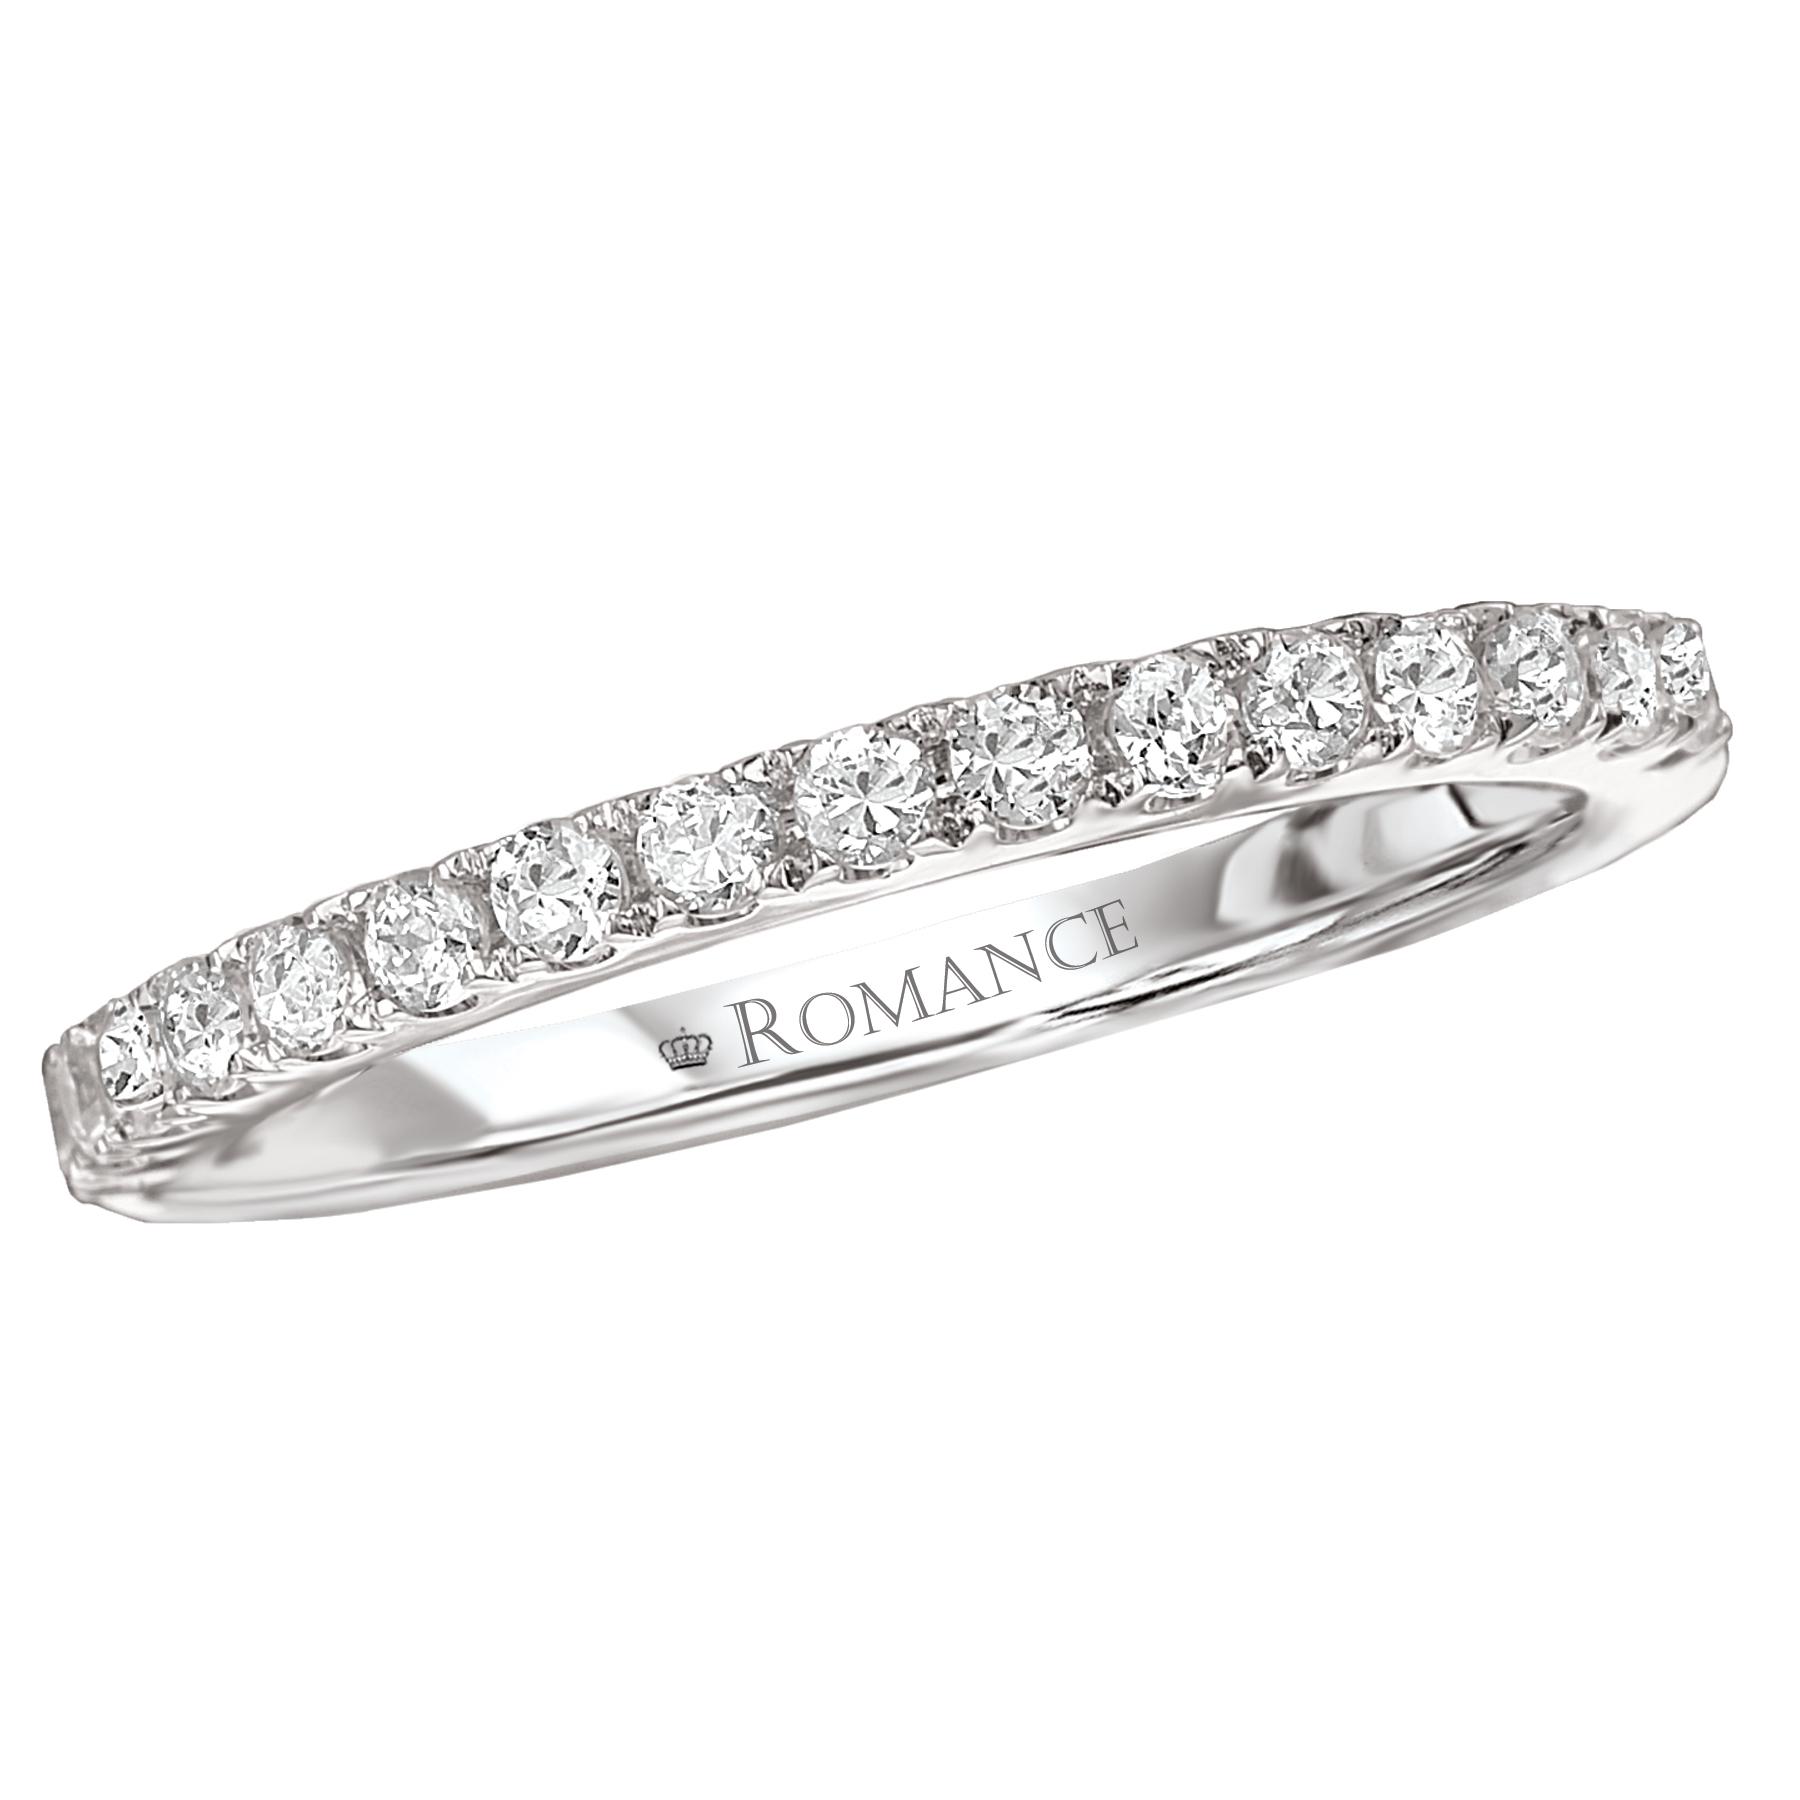 Romance Wedding Bands 117328-W product image